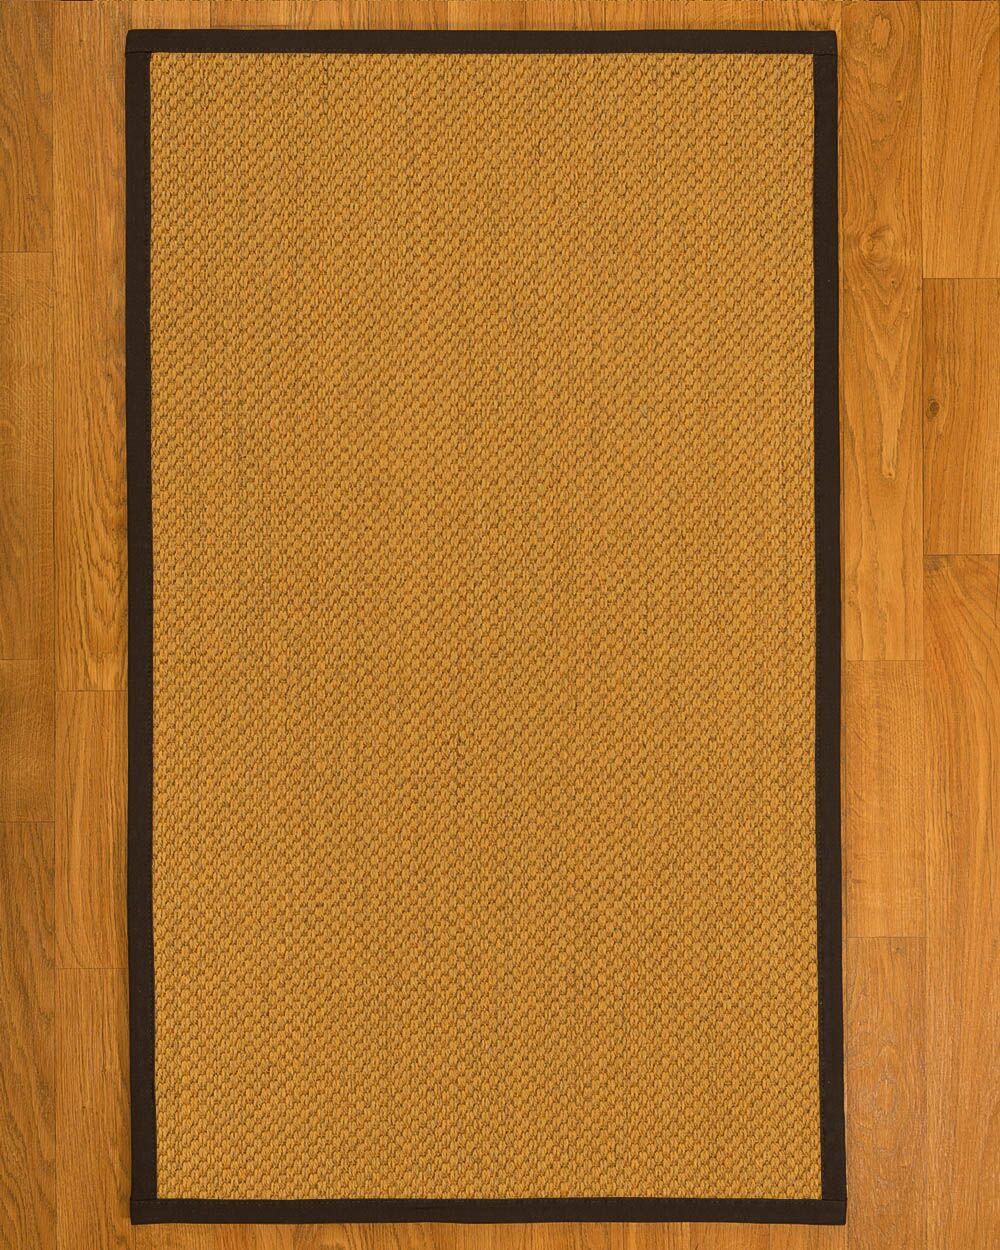 AuroraHand Woven Rustic Fiber Sisal Brown/Fudge Area Rug with Rug Pad Rug Size: Rectangle 5' x 8'